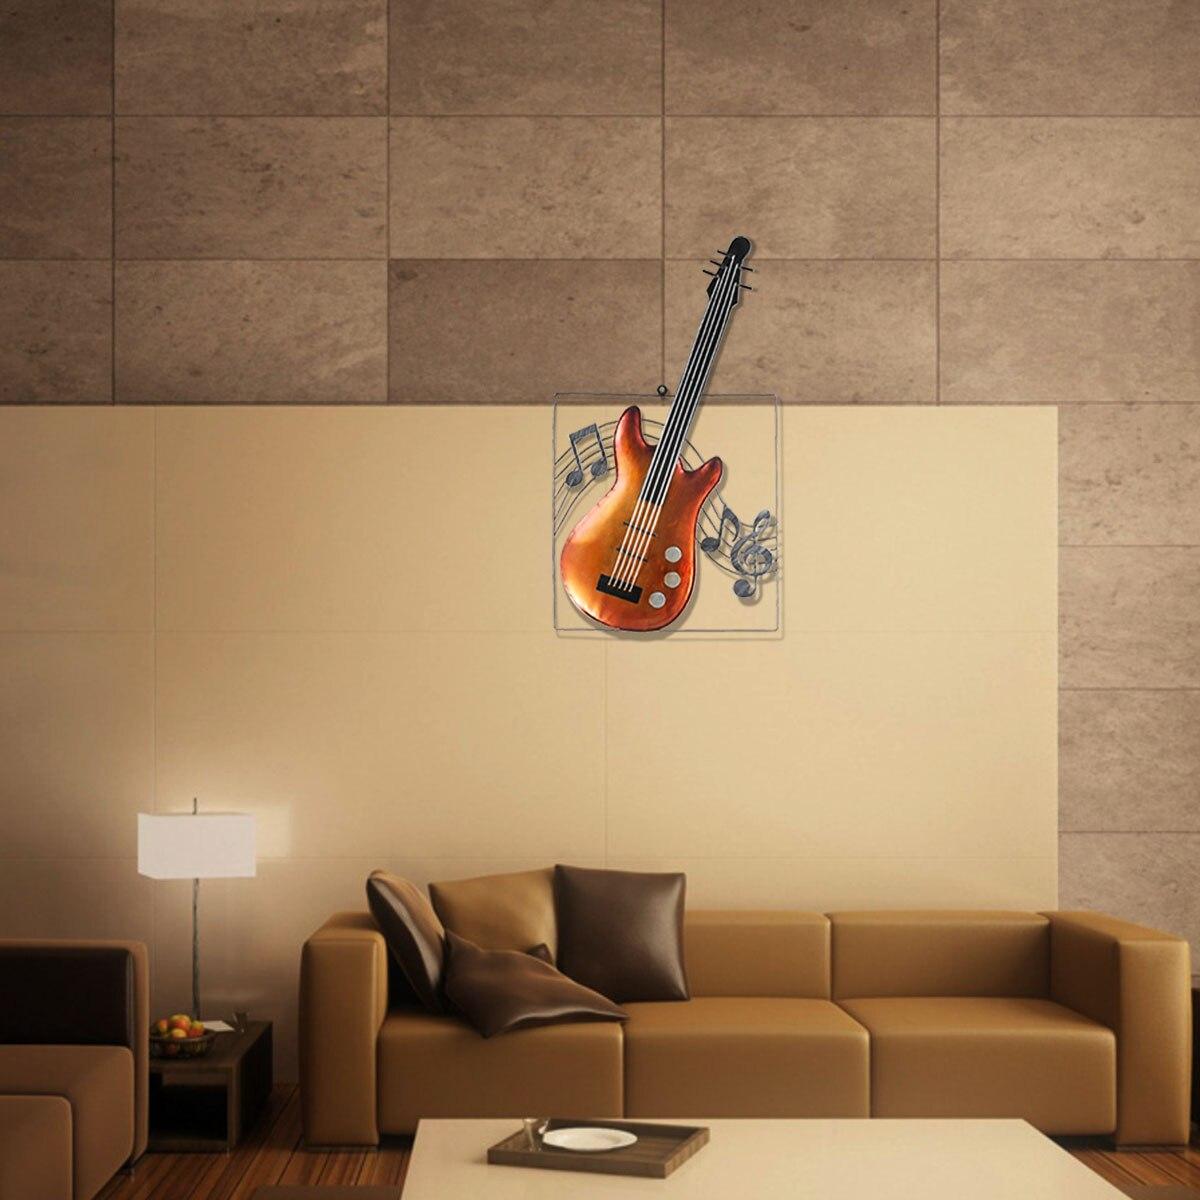 Tooarts Guitar Musical Elements Figurine Ornament Modern Metal Home ...